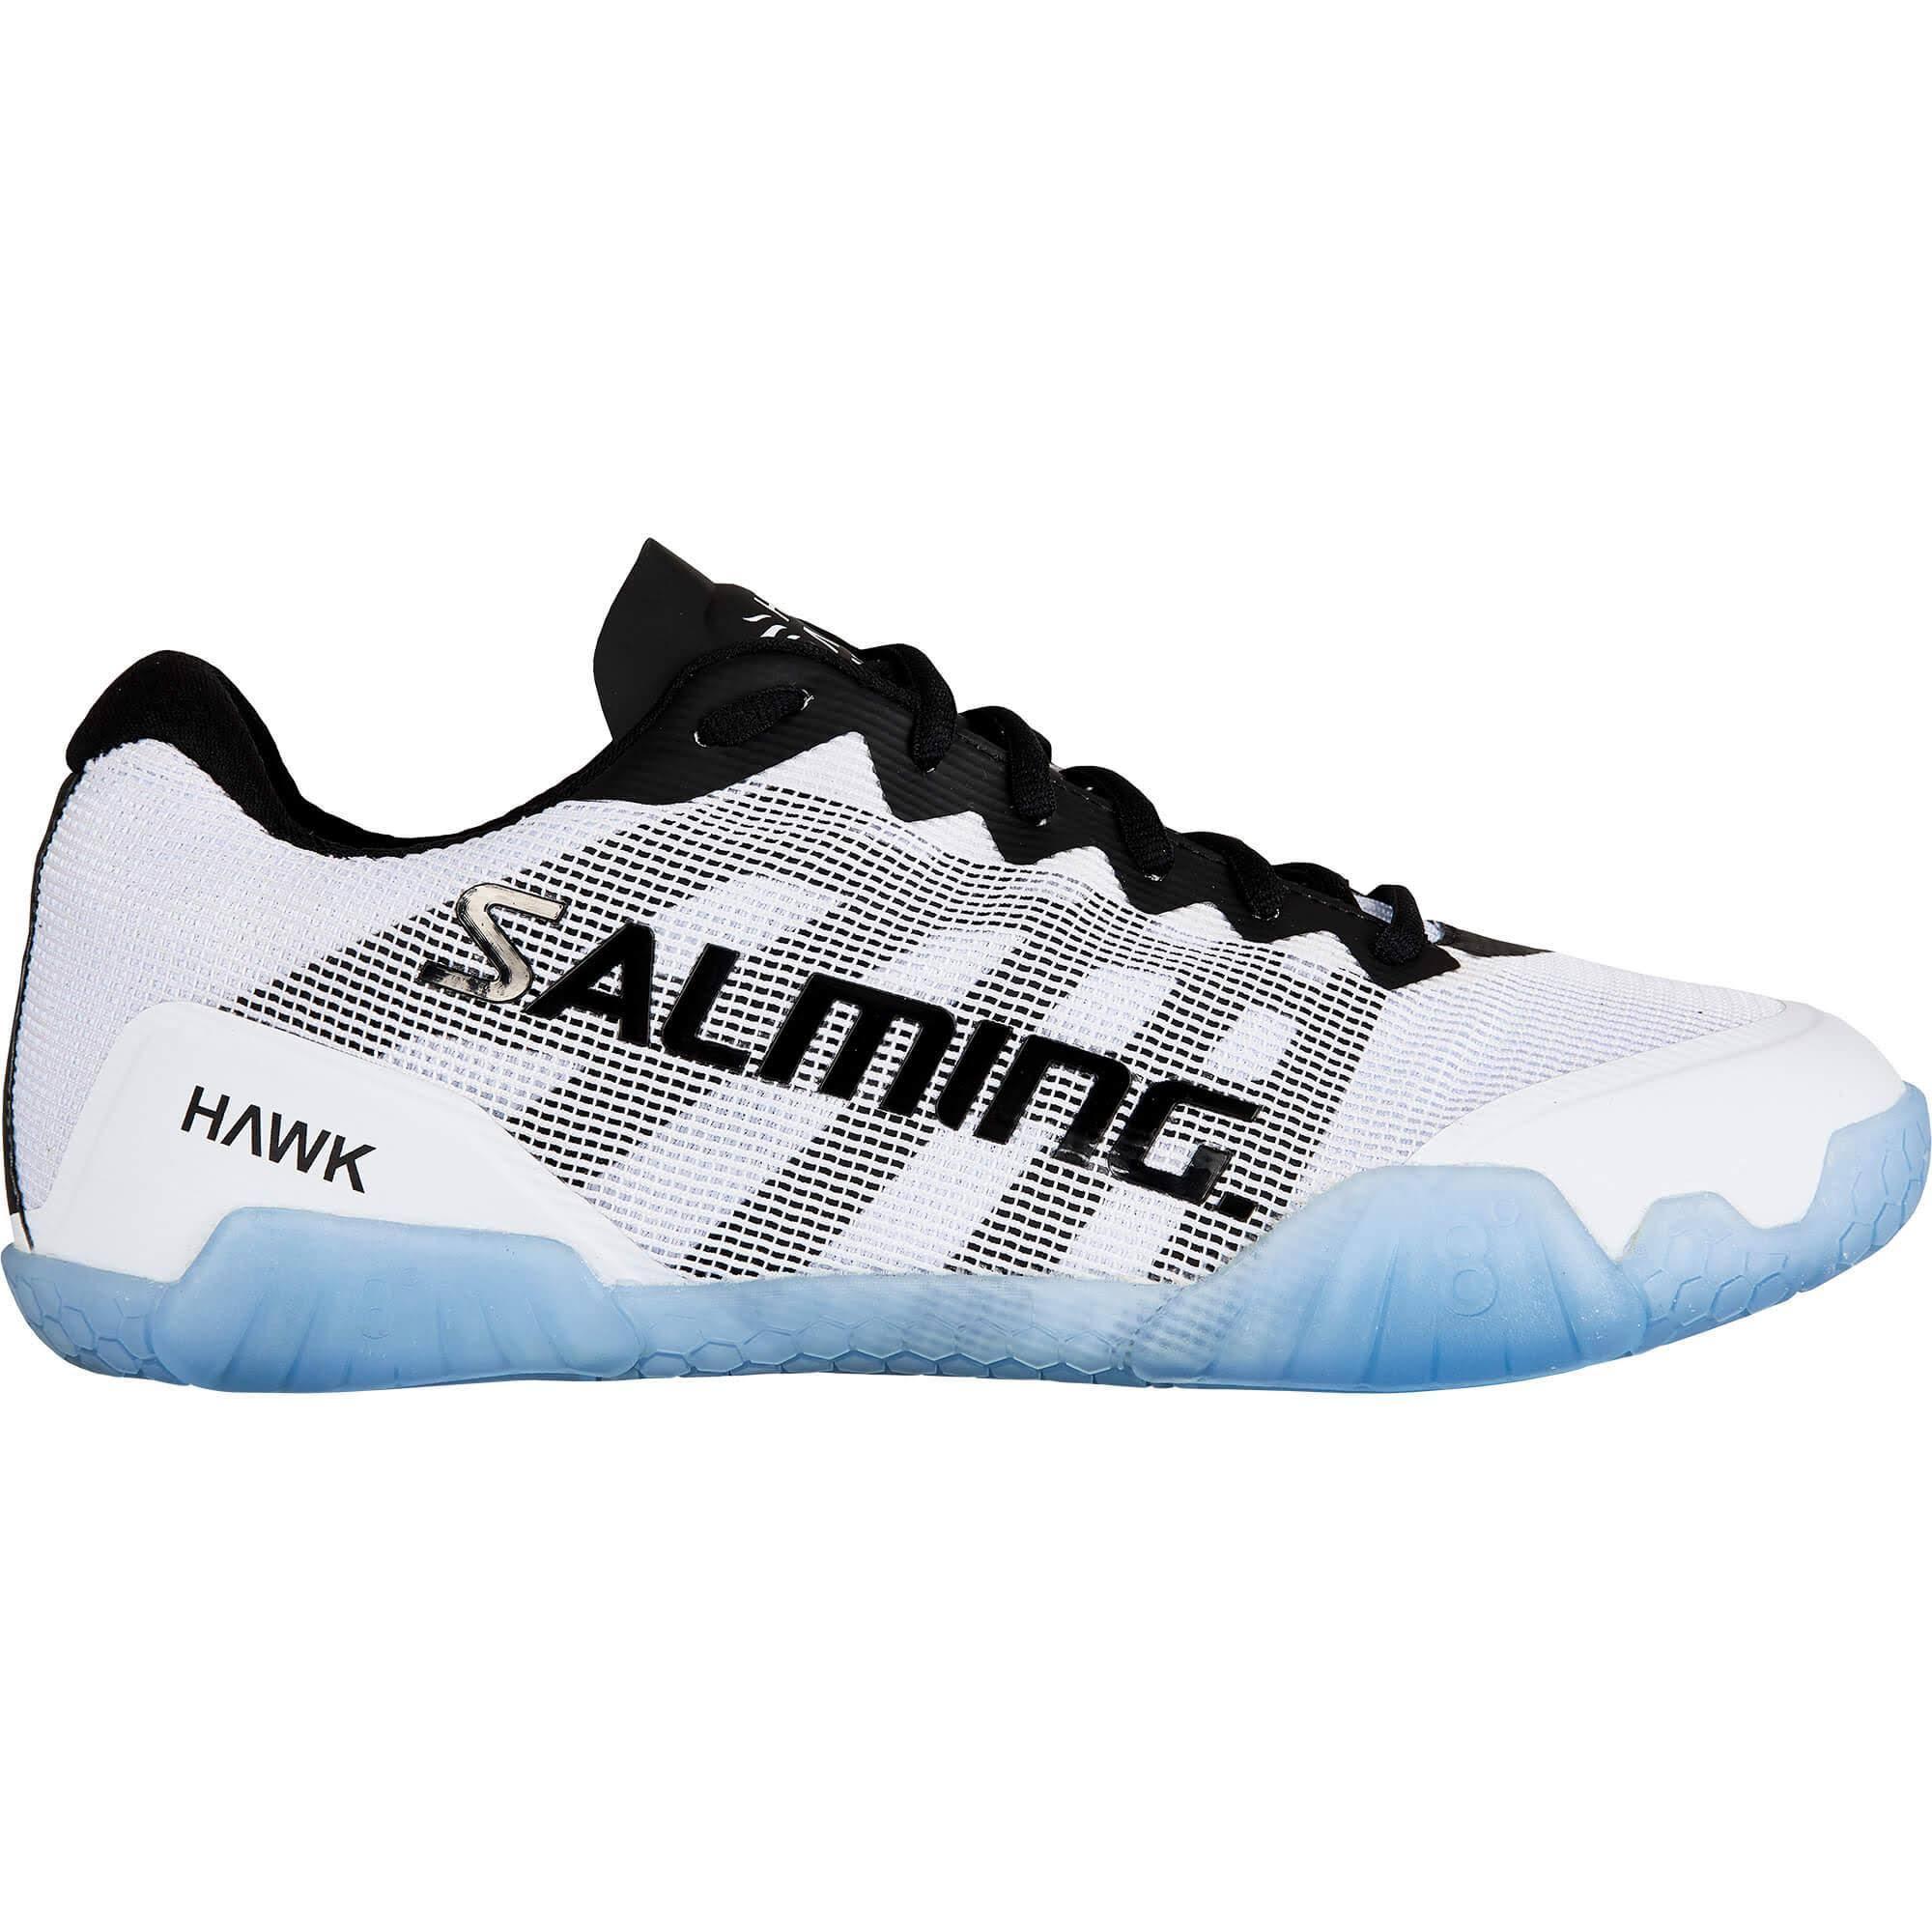 Salming Mens Hawk Indoor Court Shoes - White/Black